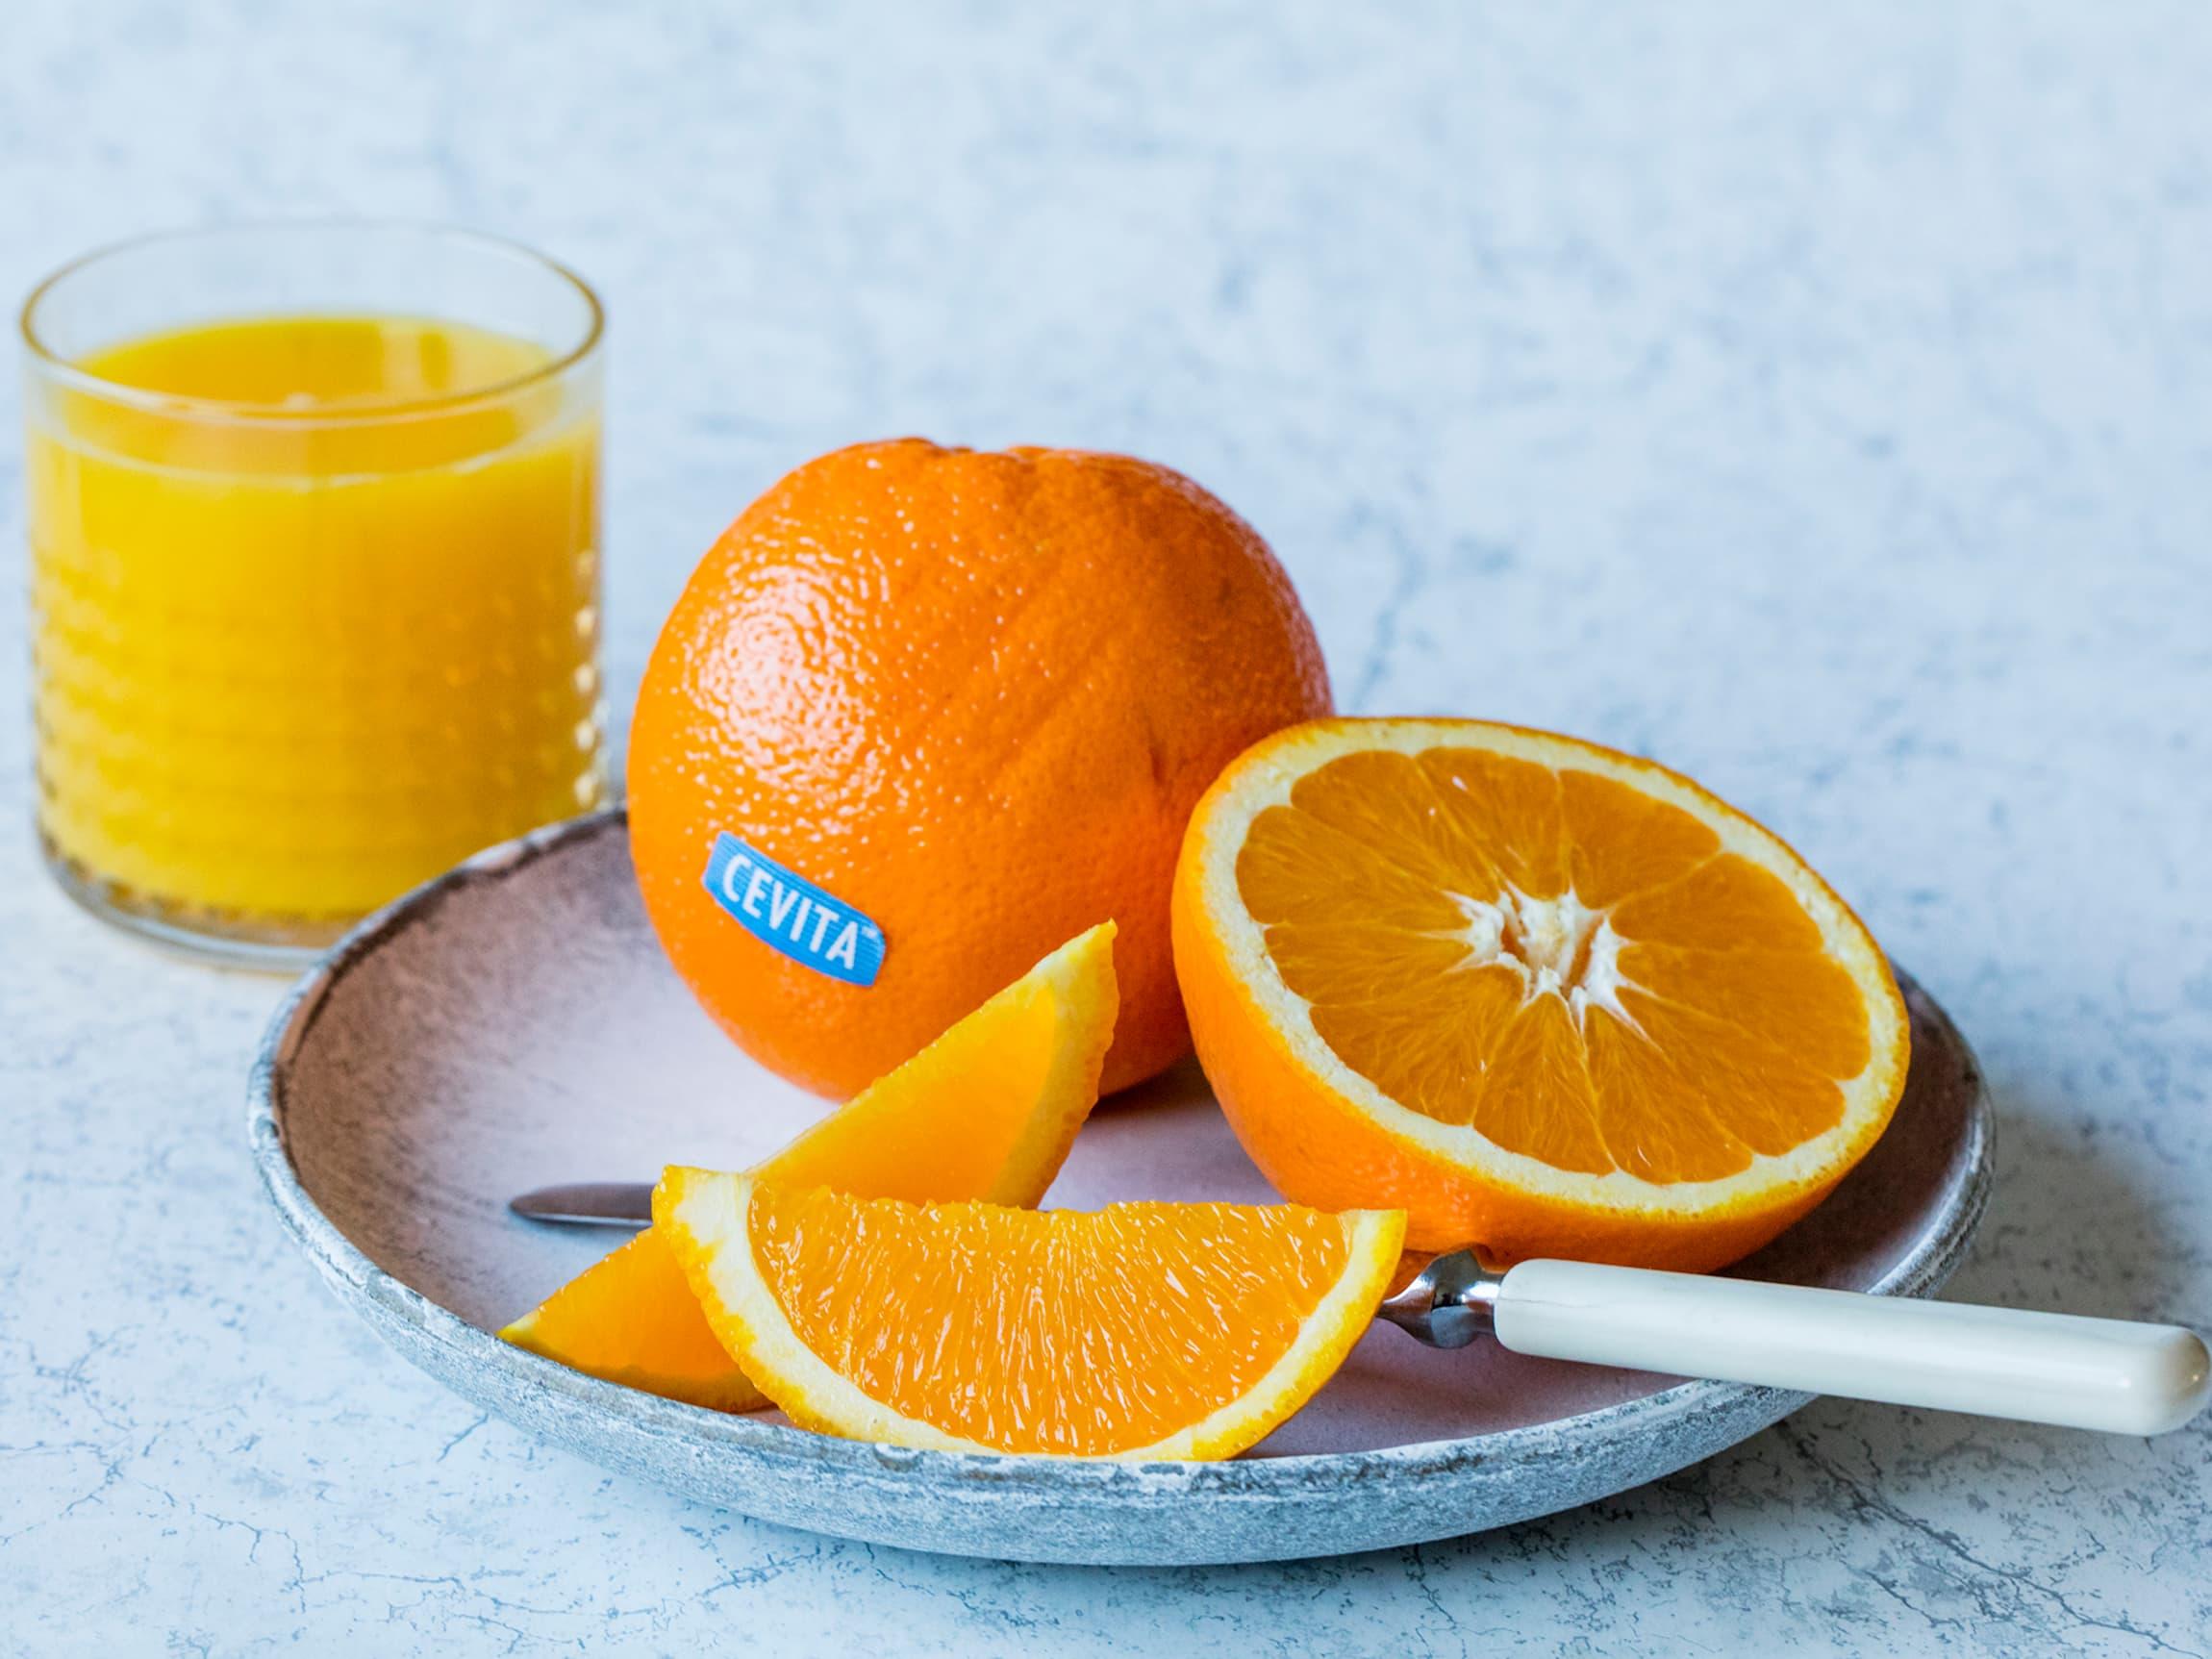 Appelsin er en viktig ingrediens i påsken.